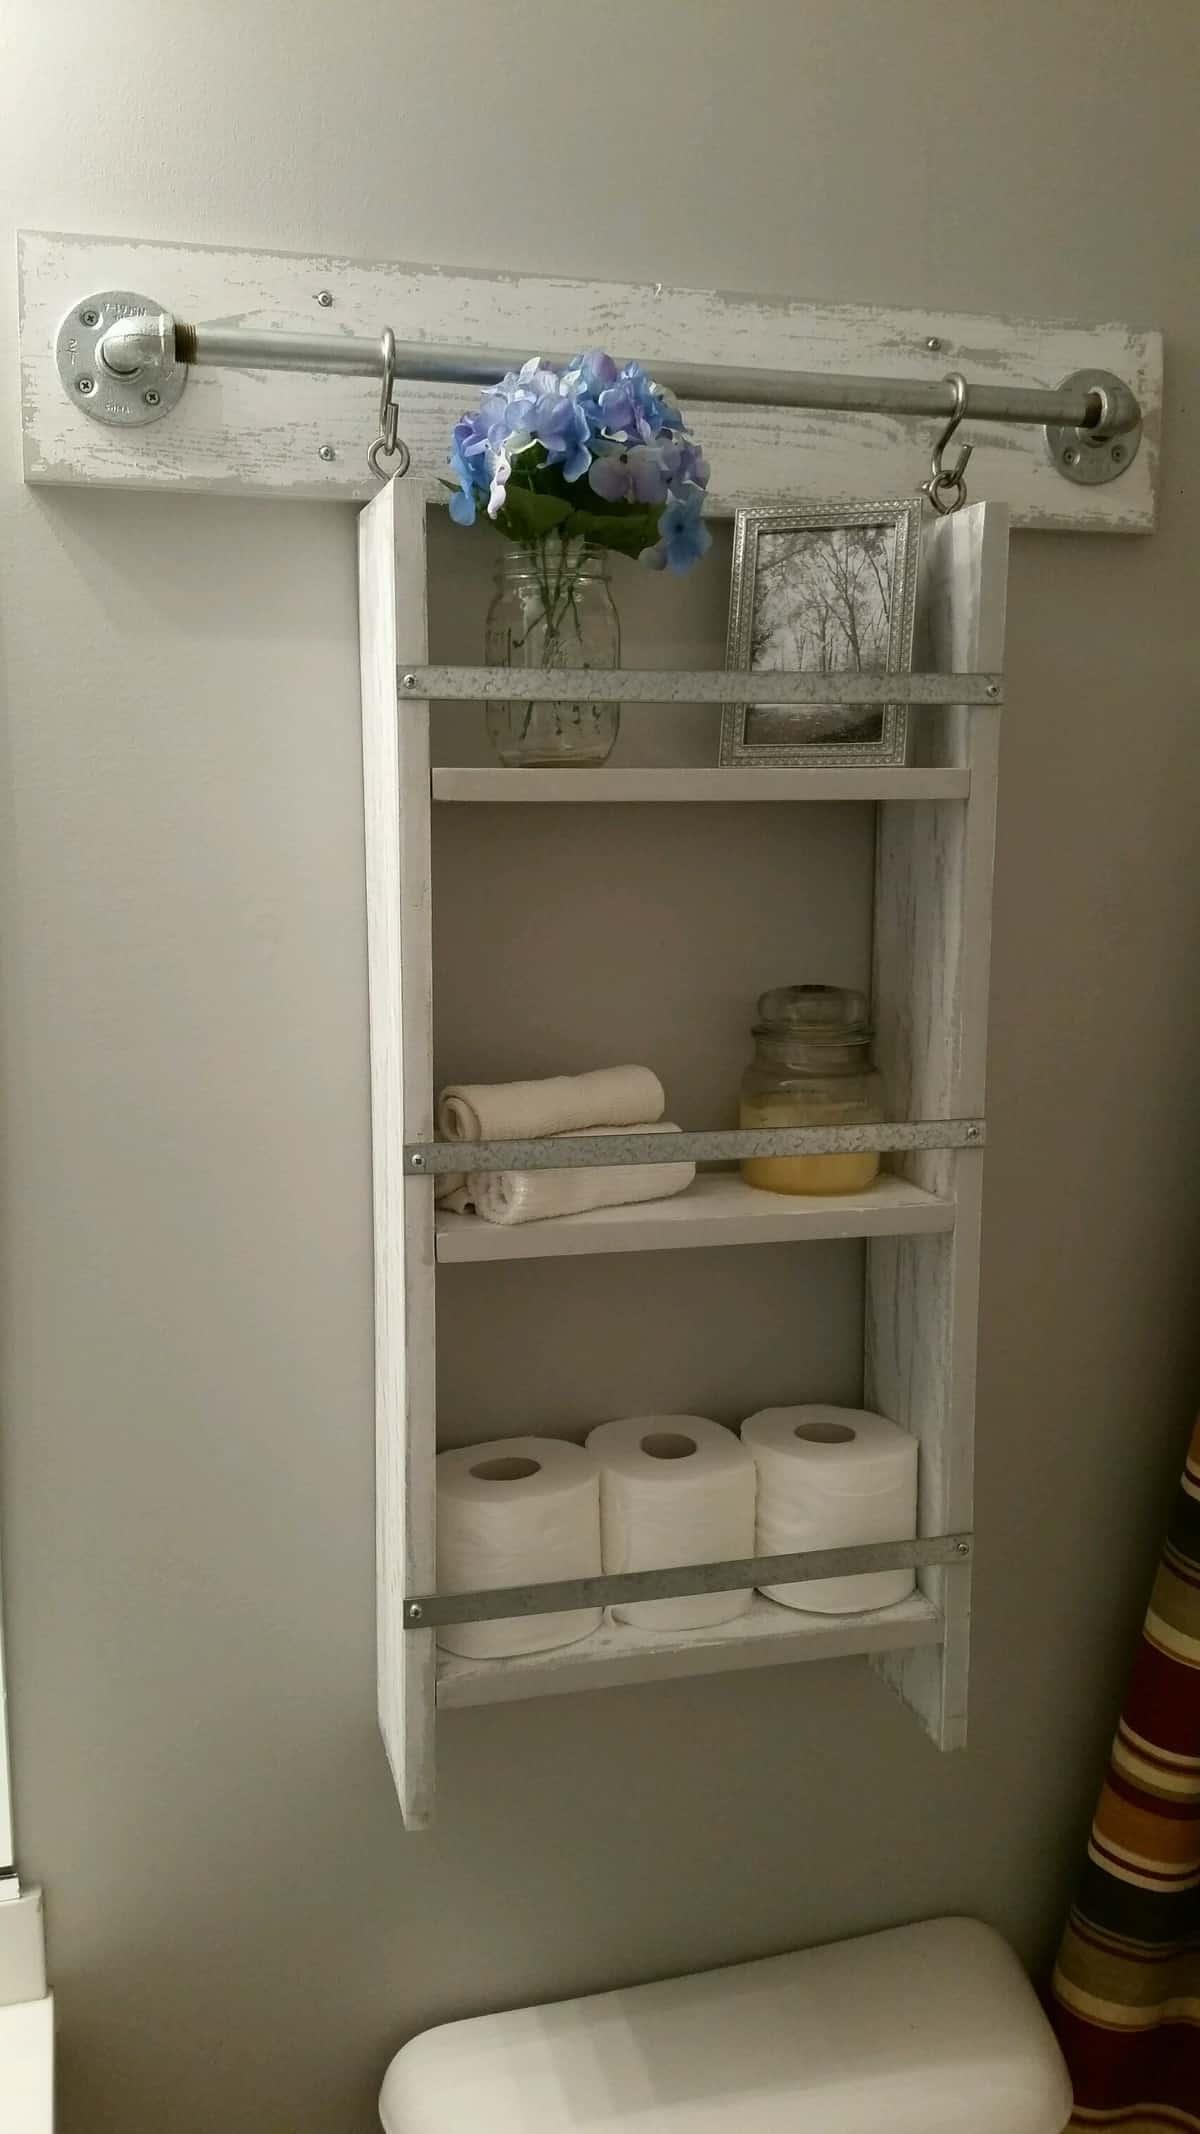 Toilet Paper Holder with Organizer Shelf